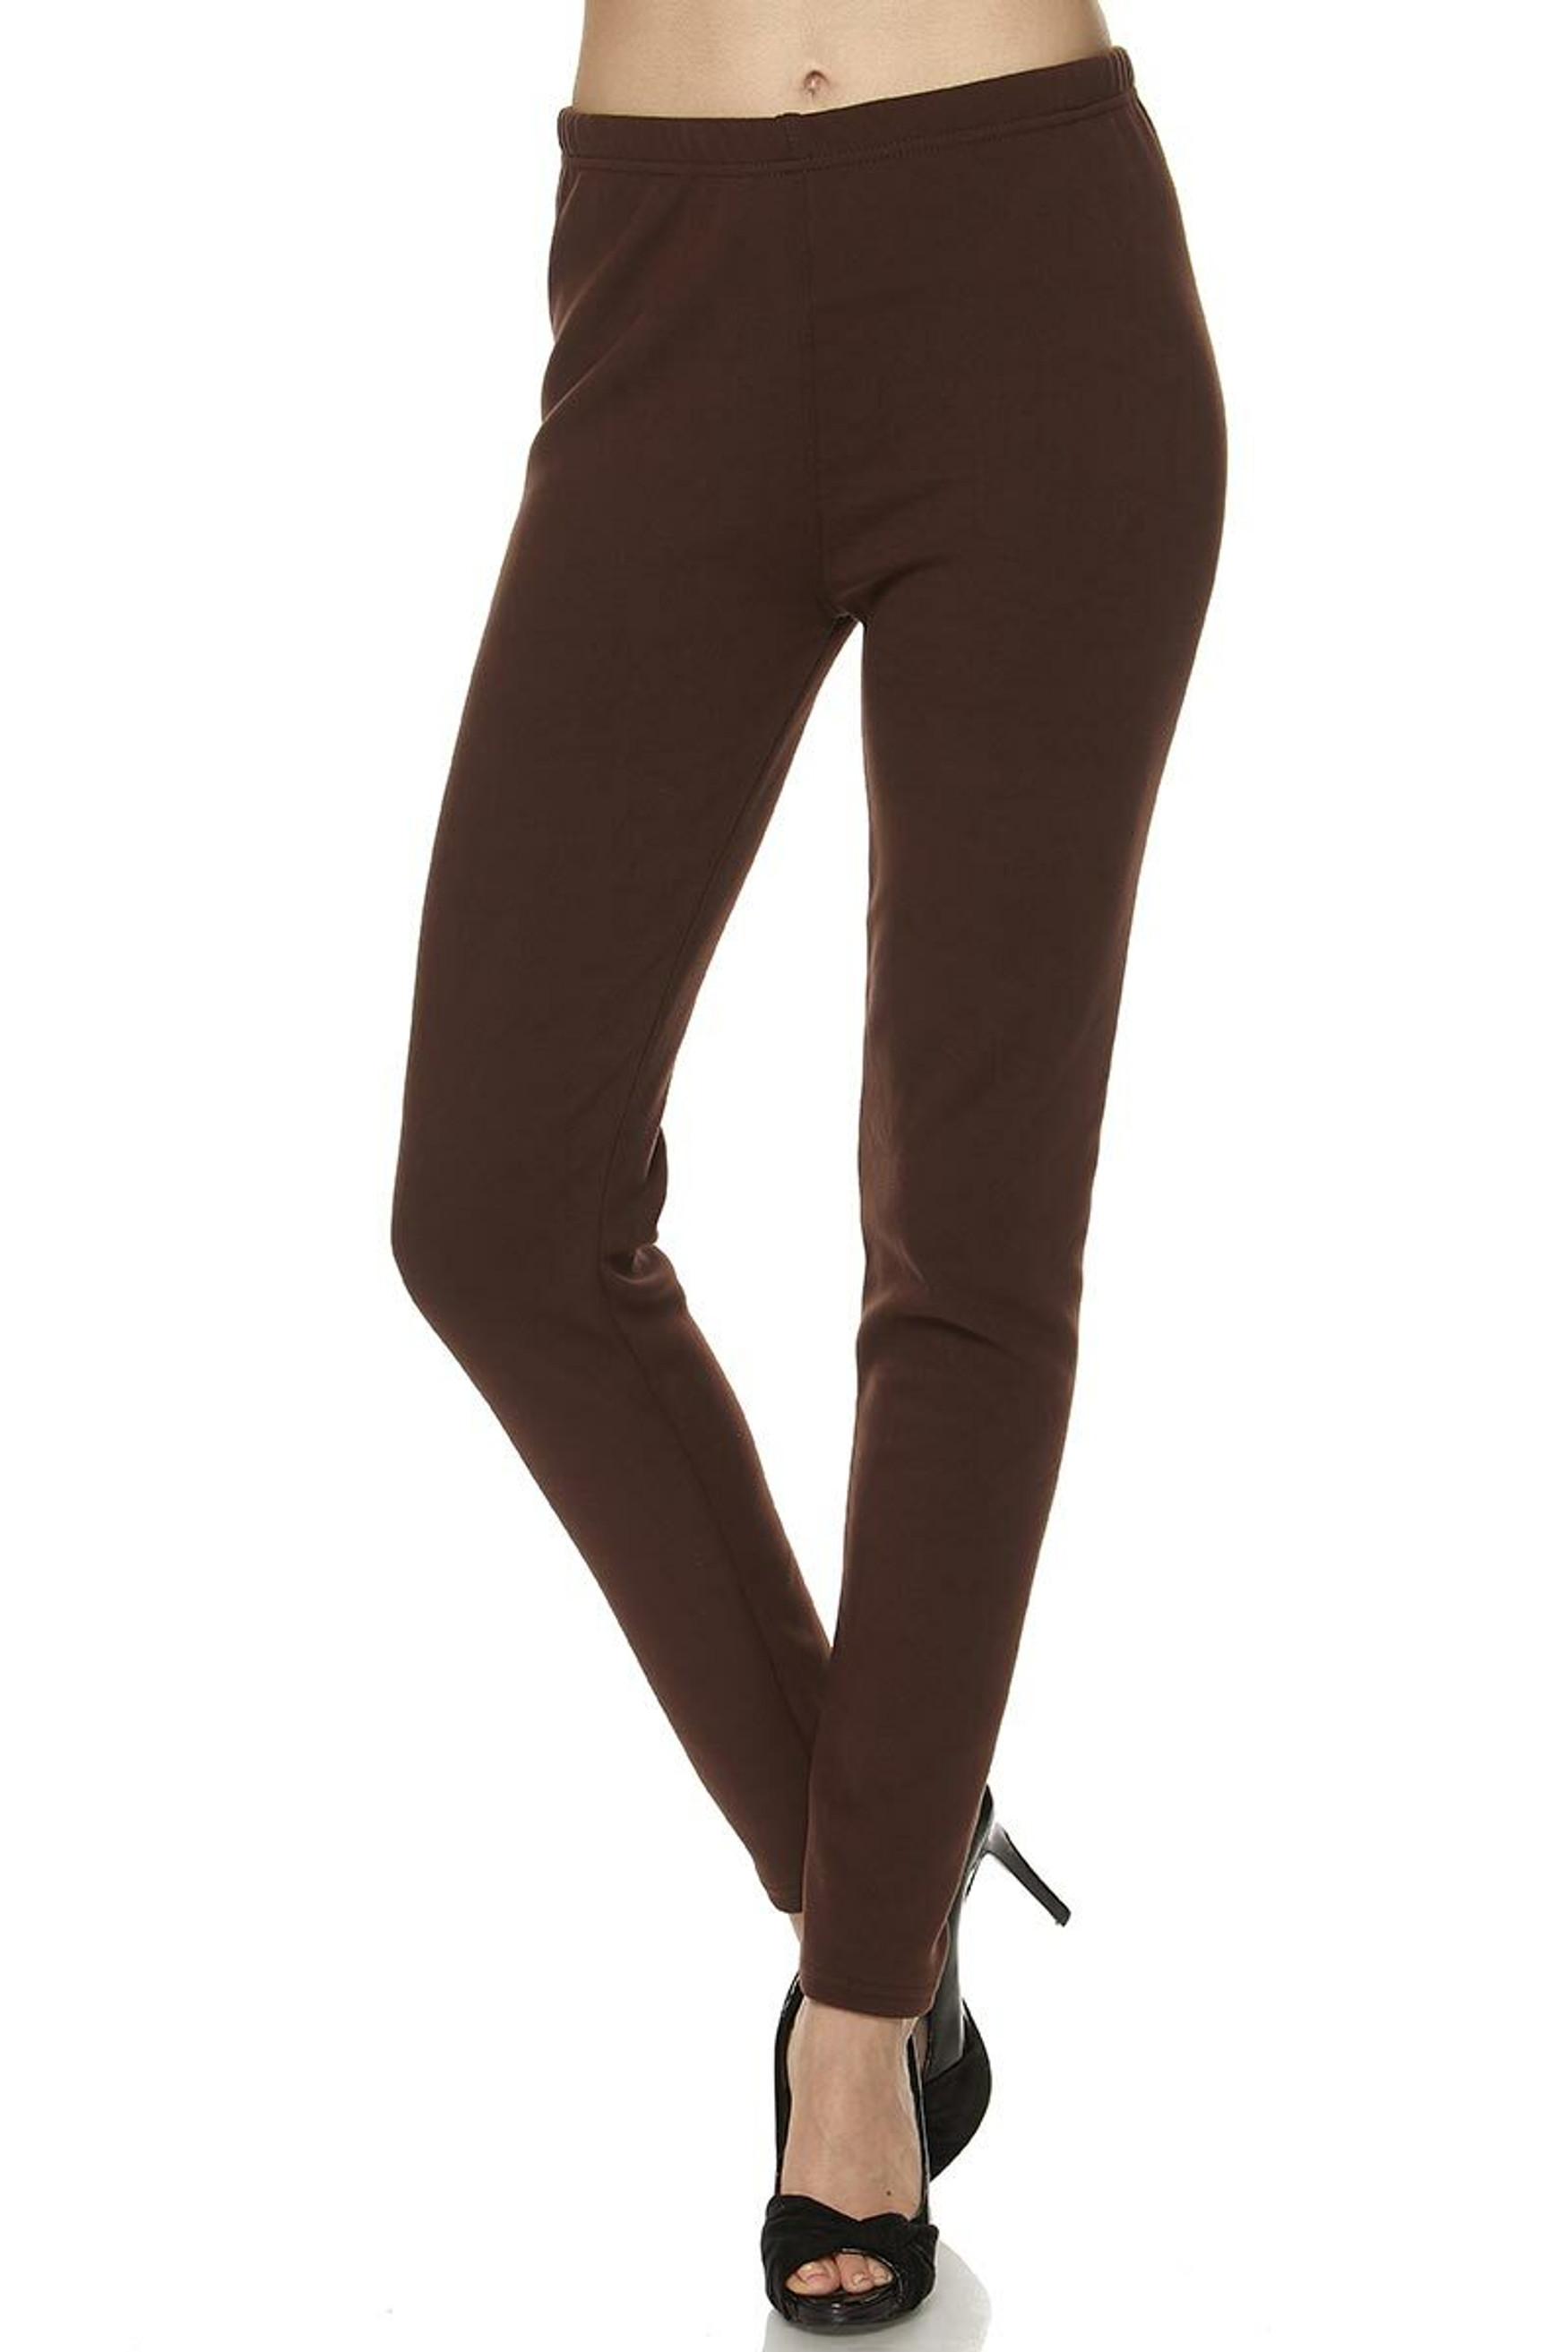 Solid Warm Fur Lined Plus Size Leggings